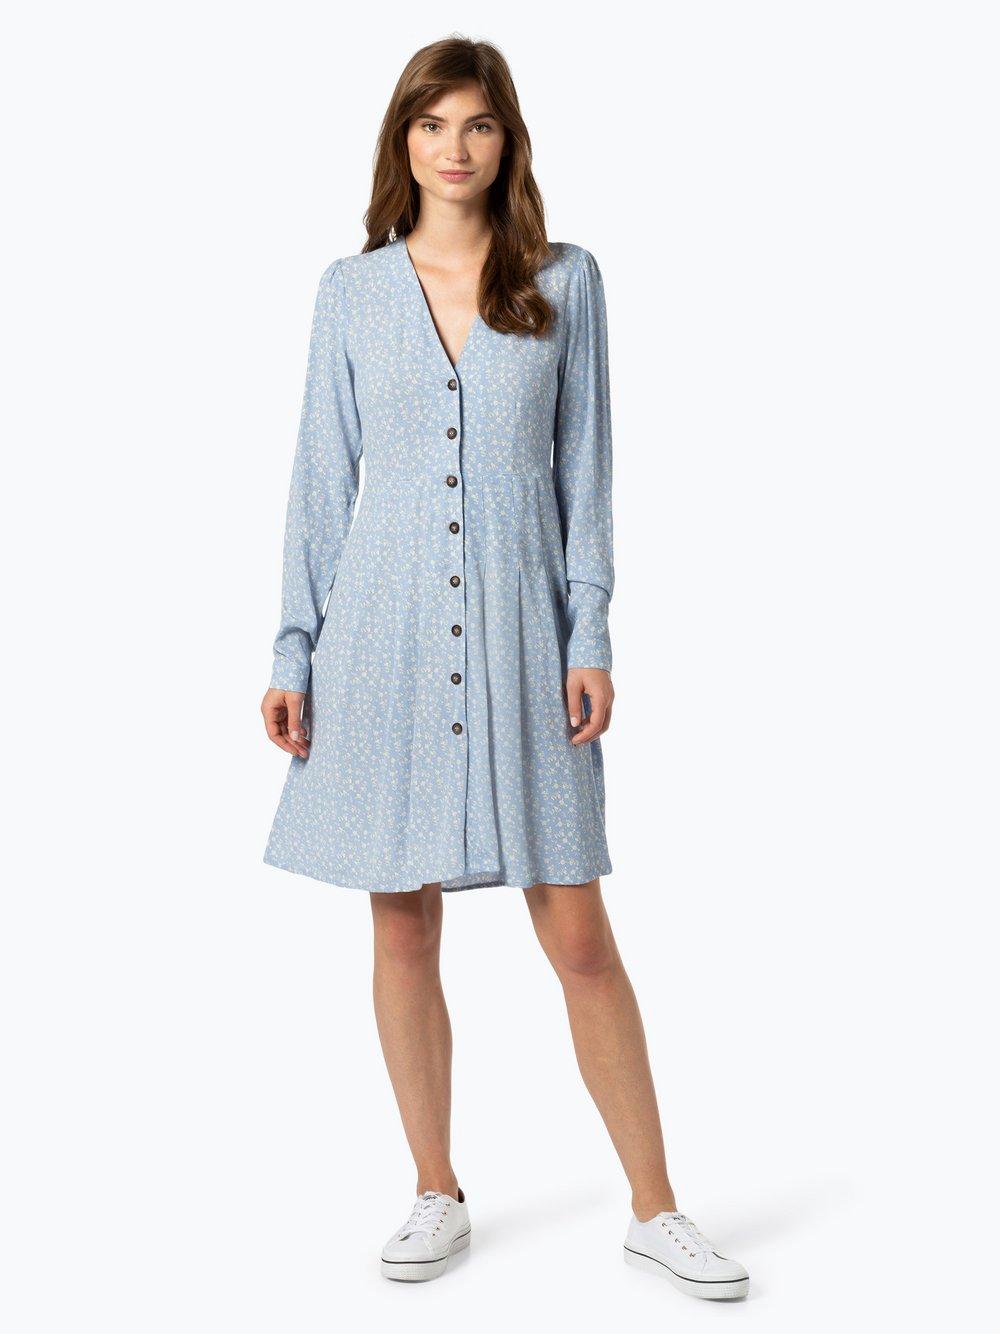 Y.A.S – Sukienka damska – Yasmau, niebieski Van Graaf 440043-0001-09900